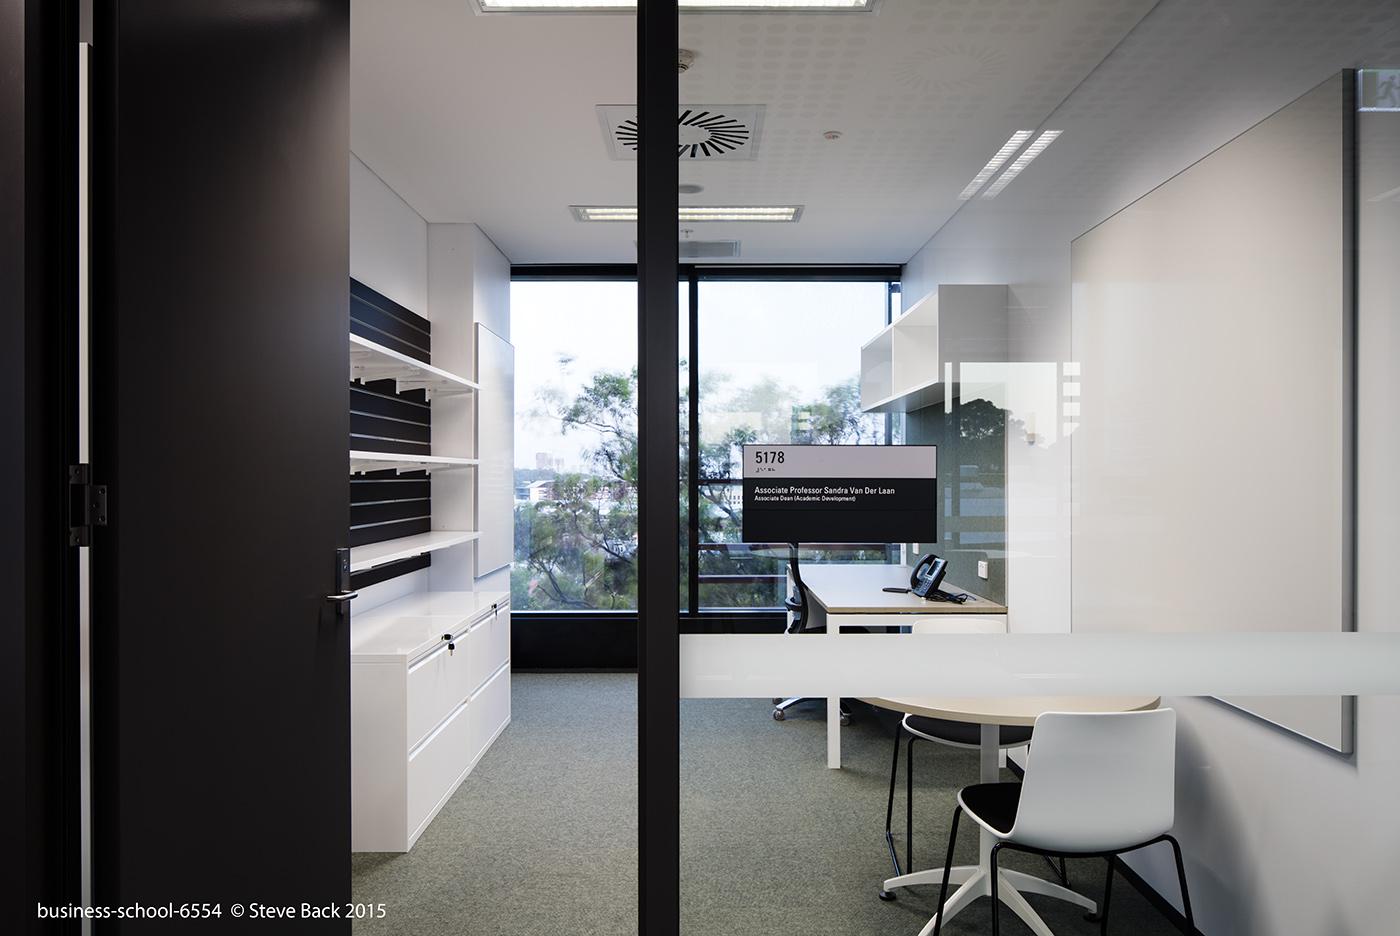 business-school-6554.jpg